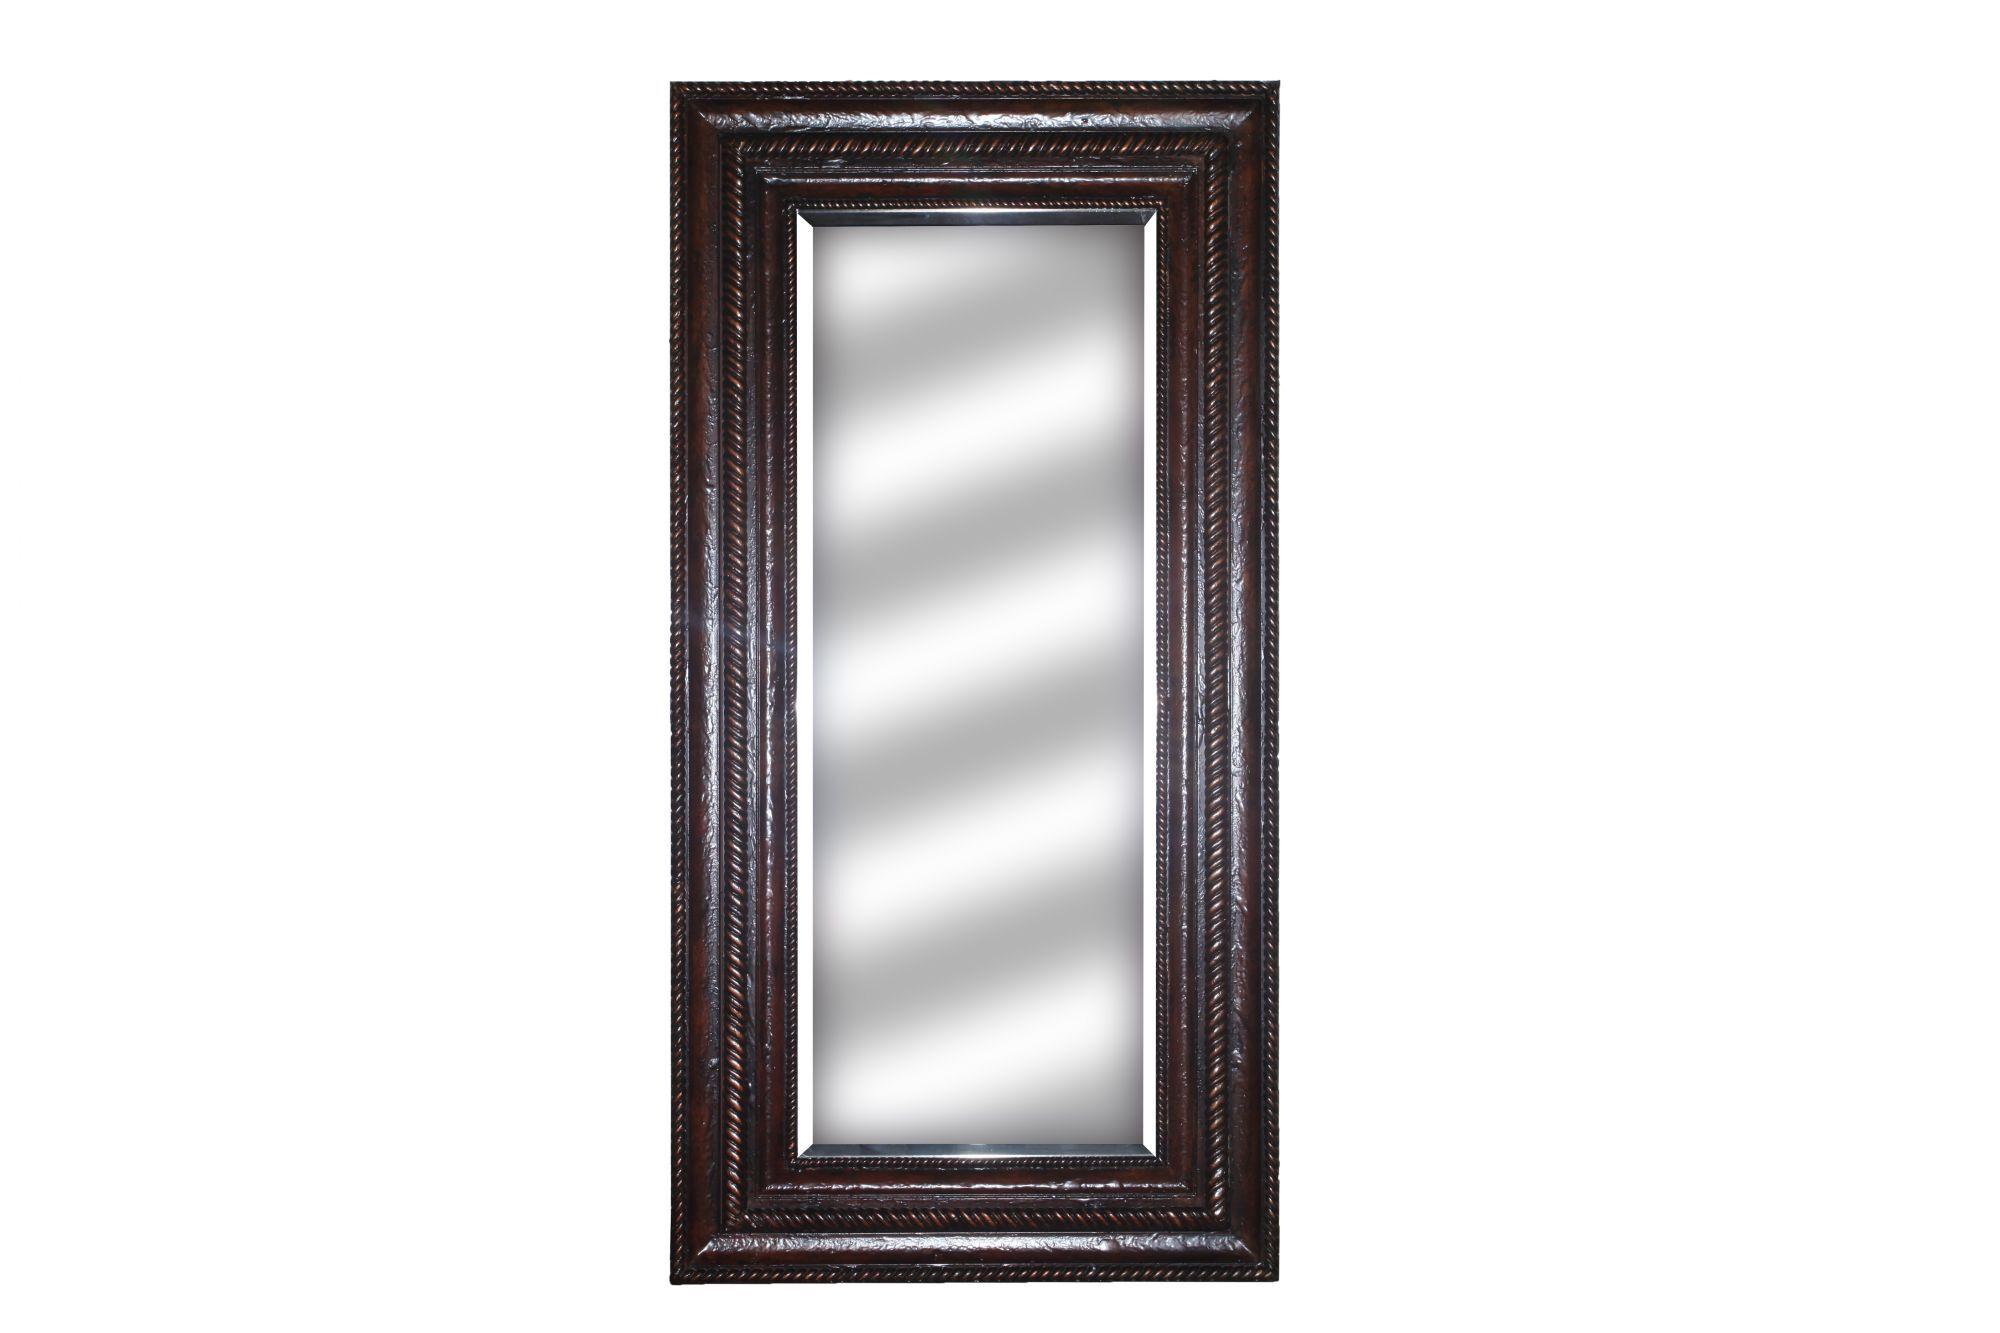 76 gadrooned floor mirror with hidden storage in brown gesso mathis brothers furniture. Black Bedroom Furniture Sets. Home Design Ideas